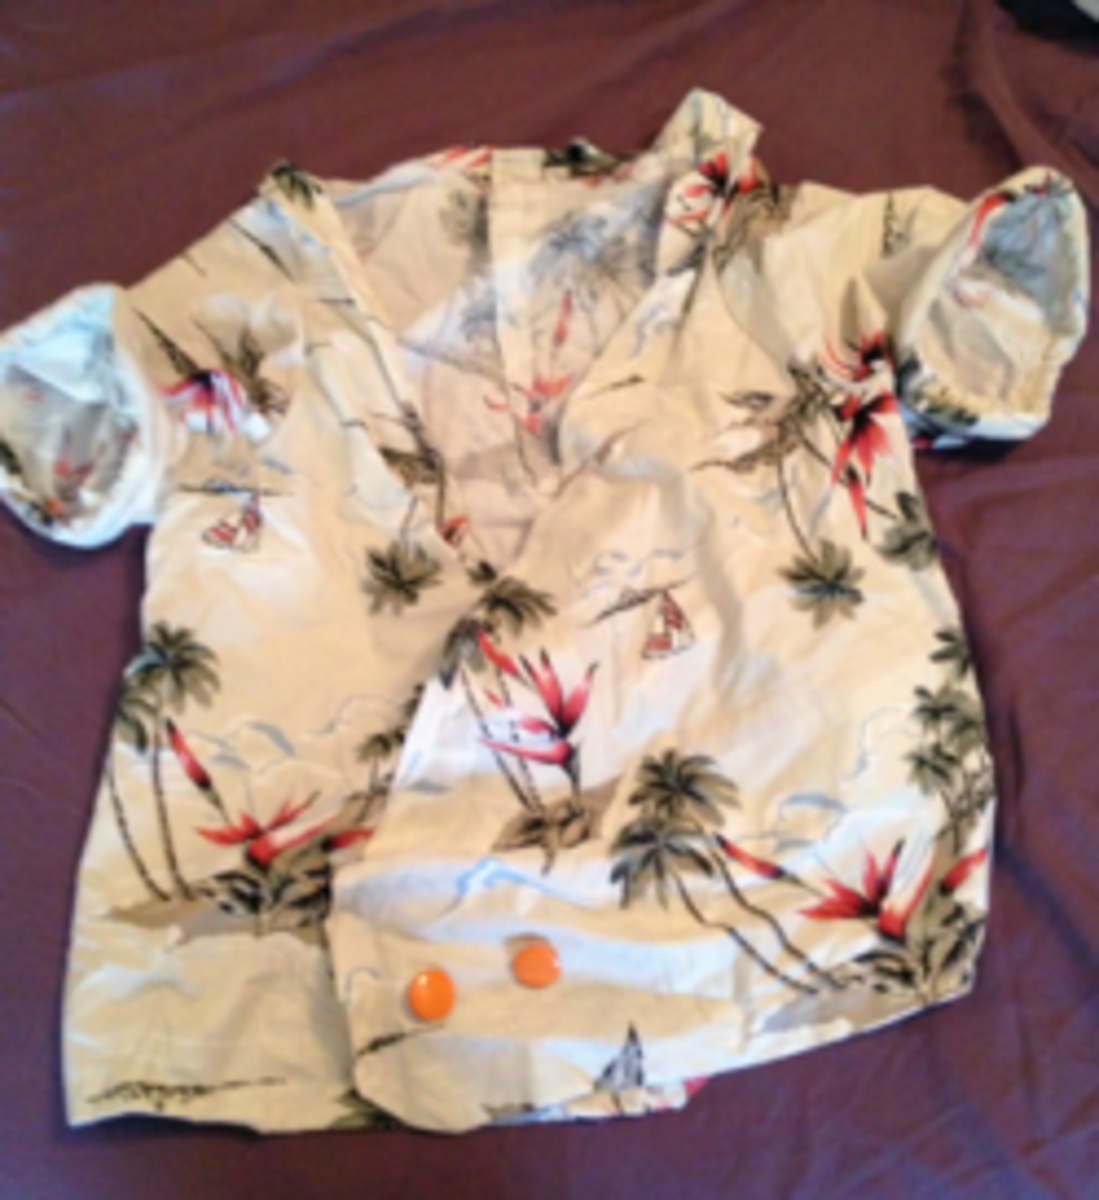 Wembley's Shirt (Fraggle Rock)